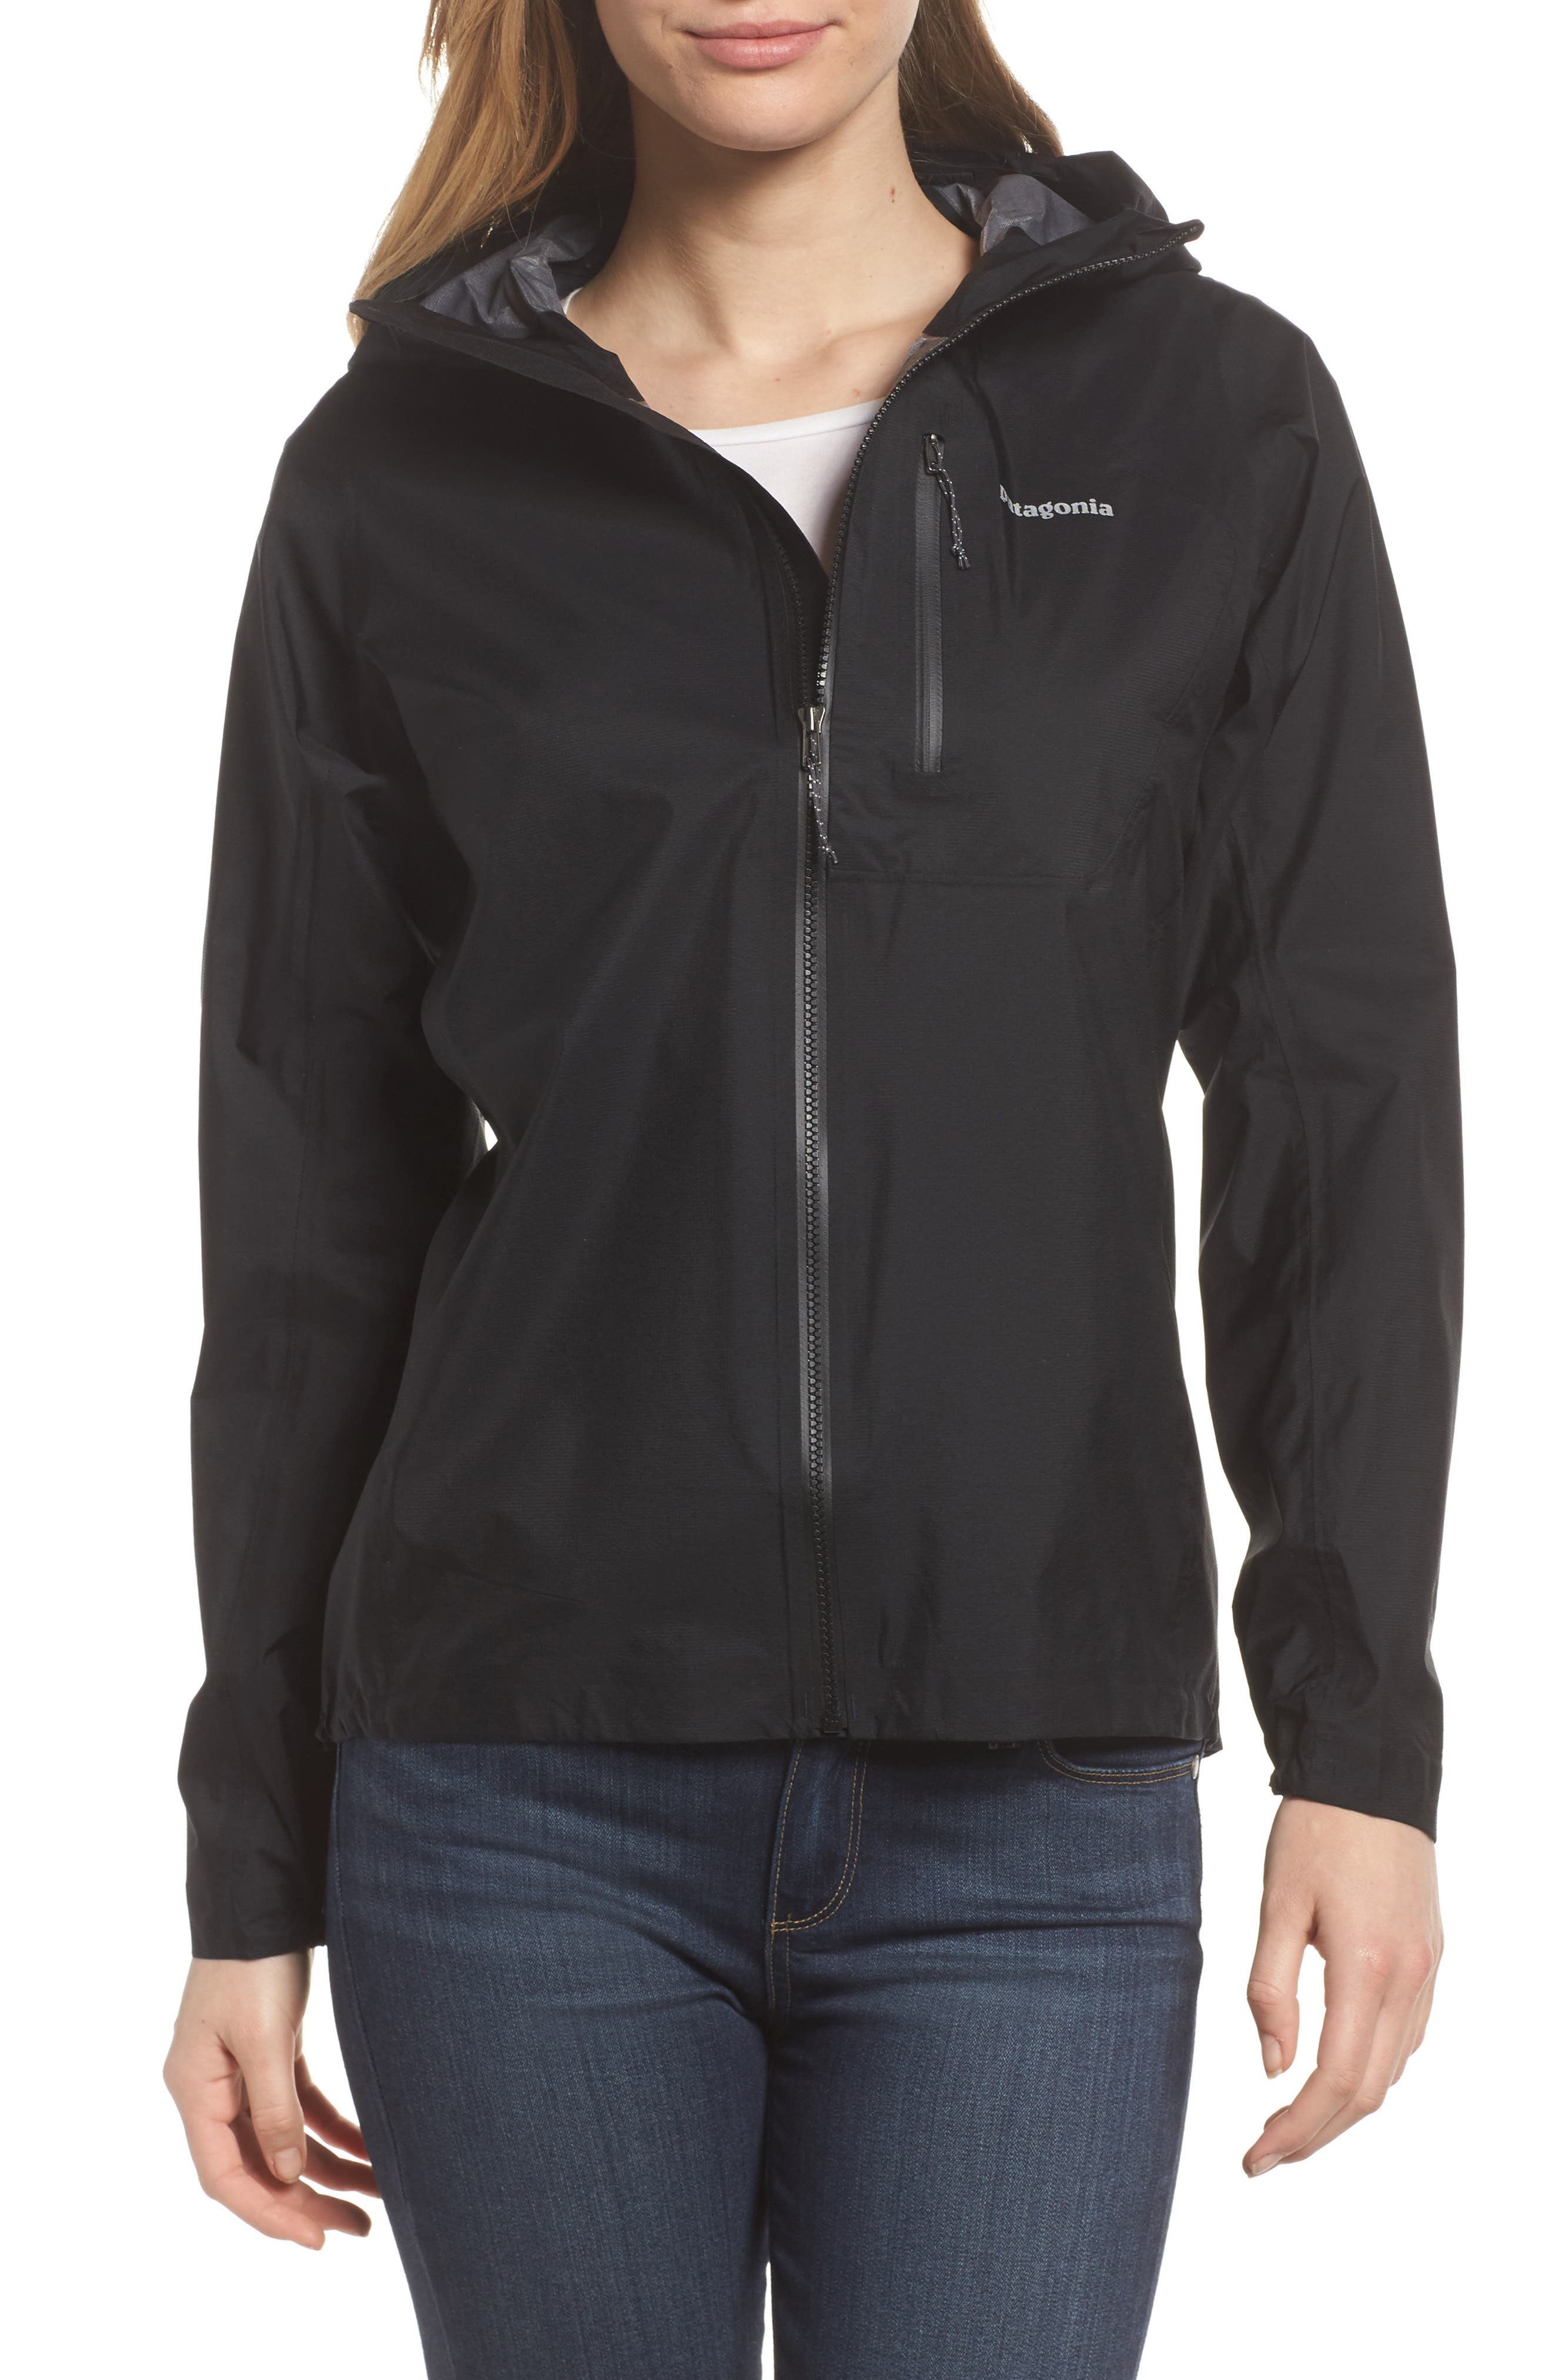 Main Image - Patagonia Storm Racer Jacket